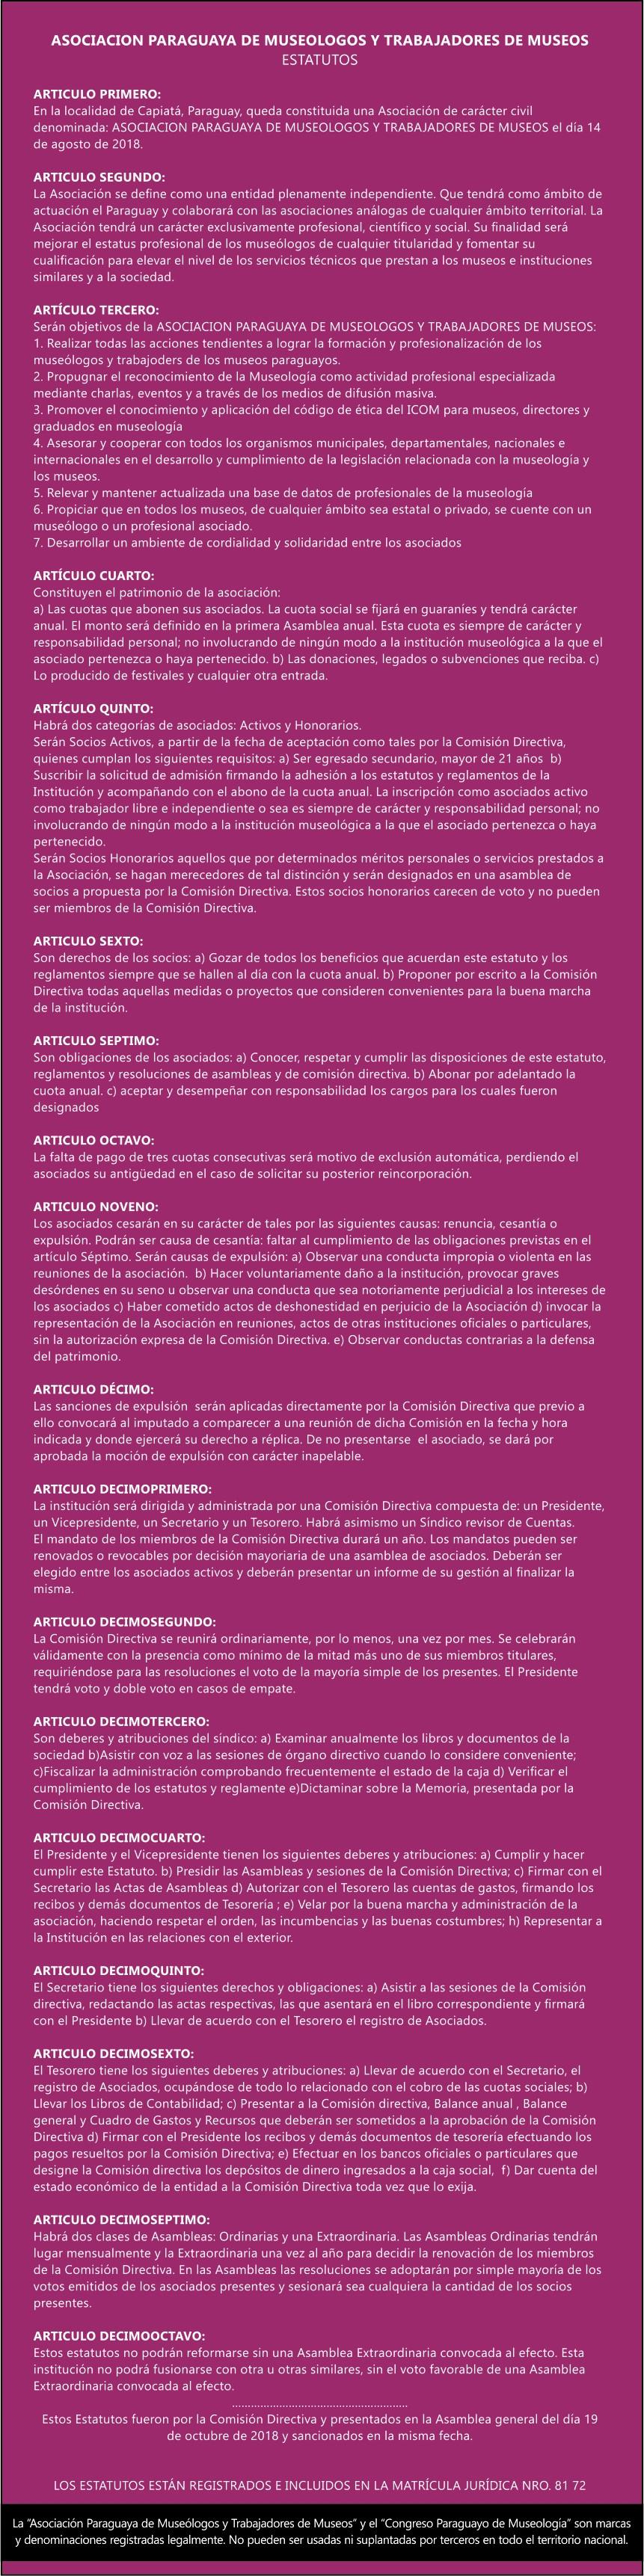 estatutos para web.jpg